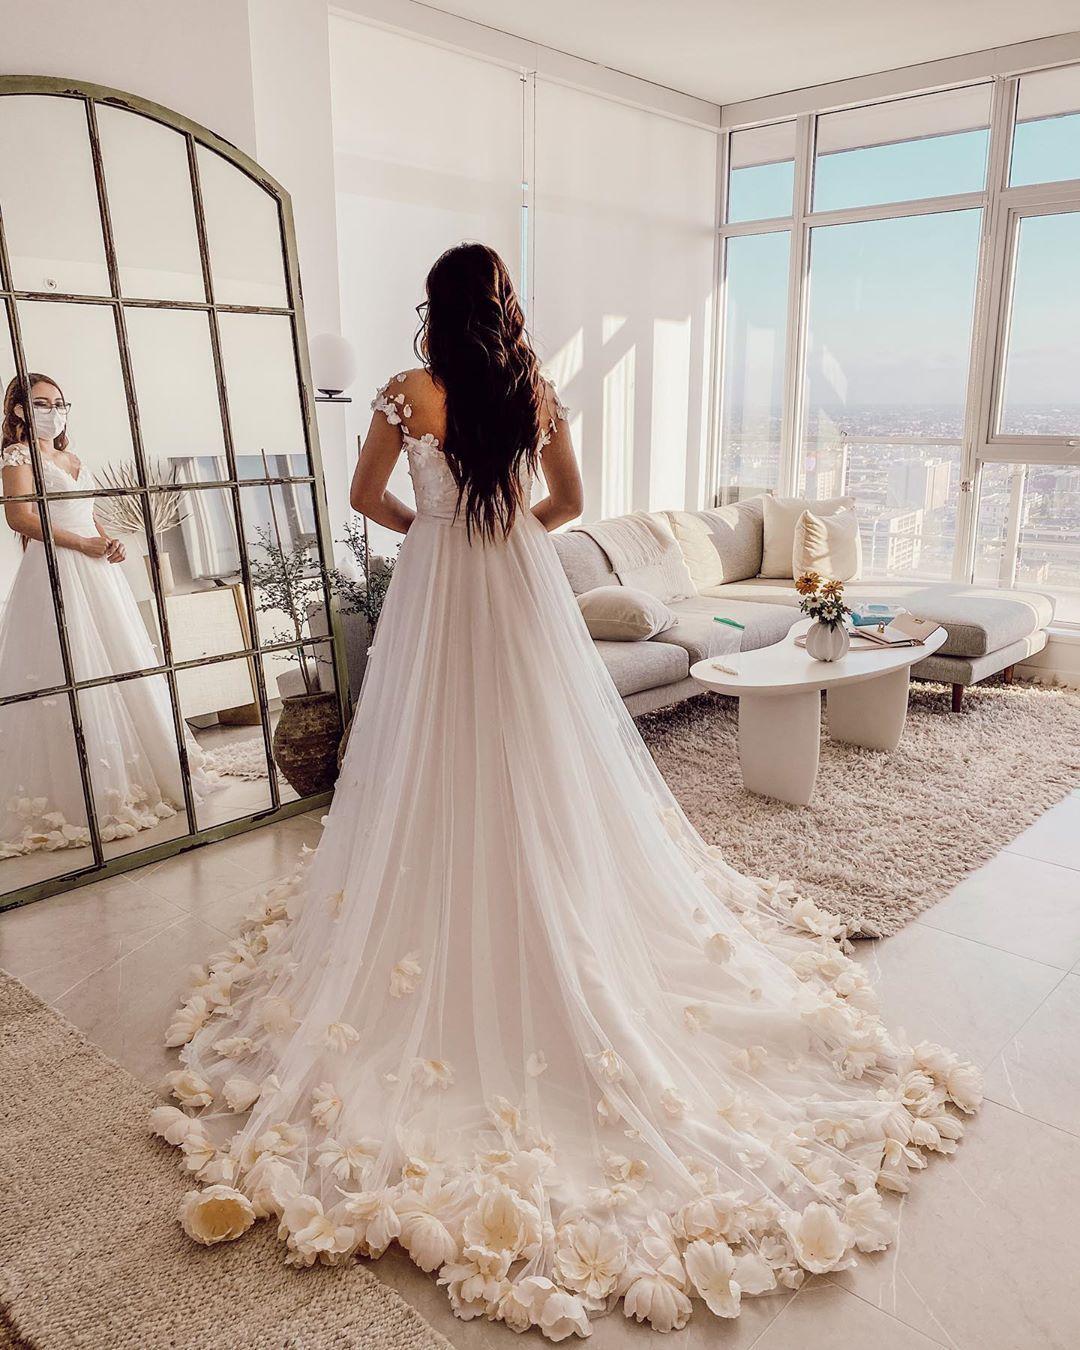 My Wedding Dress Video Is Up Link In My Bio Wow What A Journey It S Been Michellehebert In 2020 Wedding Dresses Videos Floral Wedding Gown Wedding Dresses